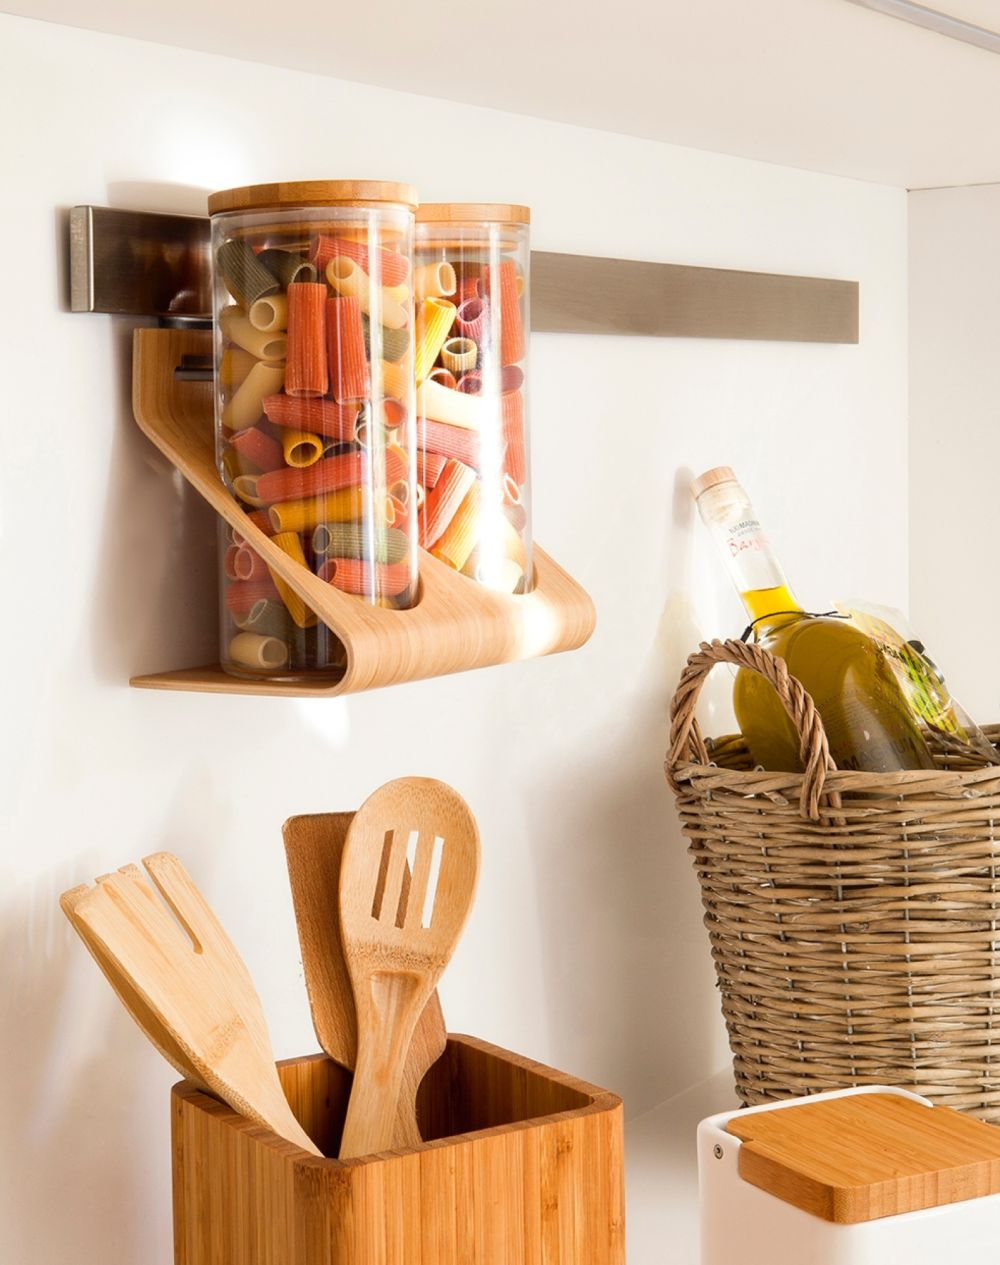 adelaparvu-com-despre-apartament-cald-in-tonuri-neutre-locuinta-spania-design-interior-laura-argelich-si-carla-casanova-foto-jordi-canosa-elmueble-6